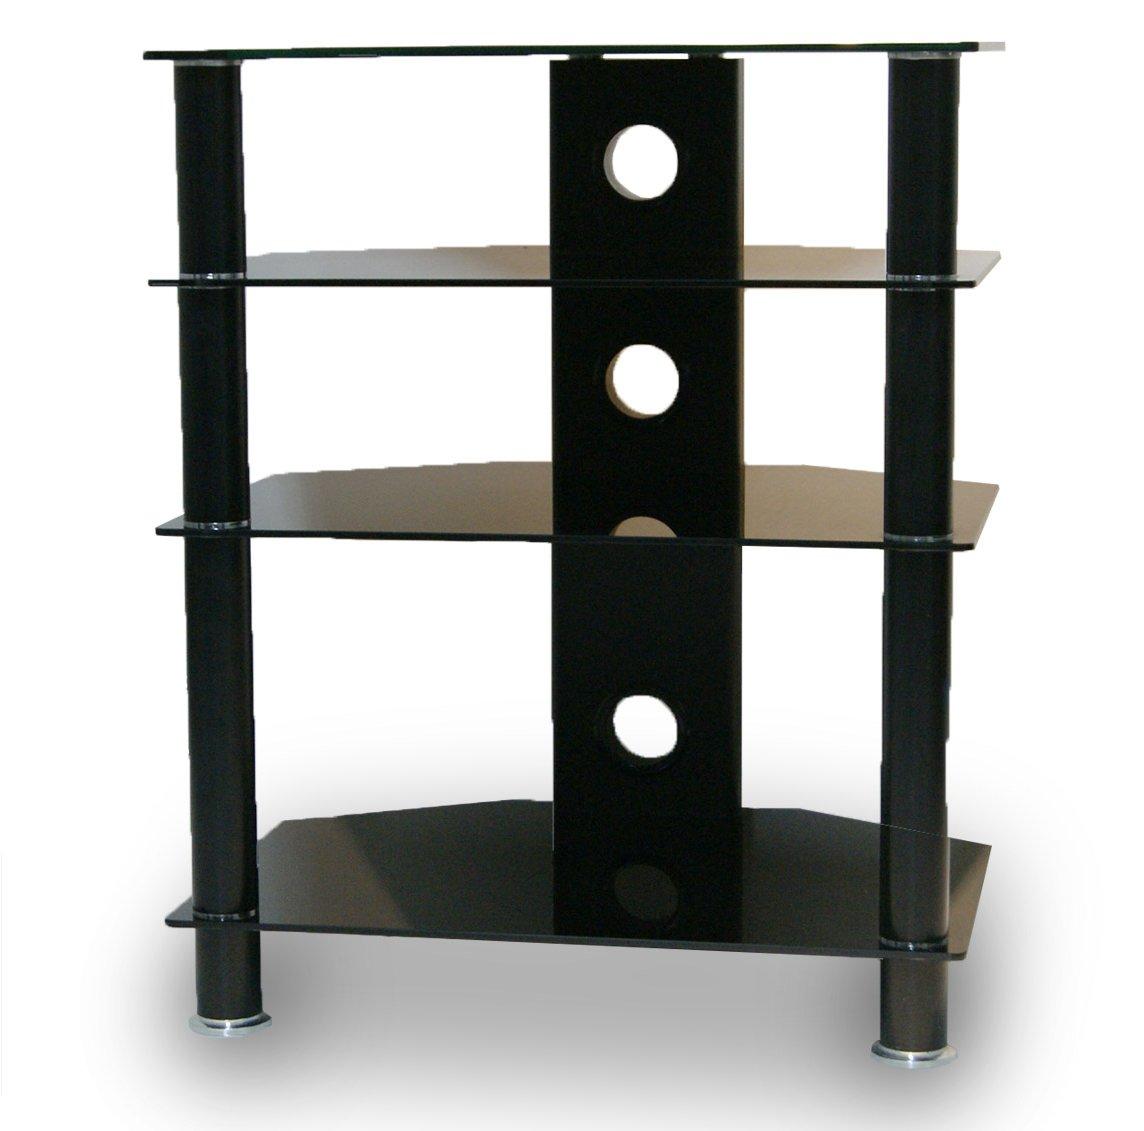 tnw avs c303r 600 4 bb hifi stands. Black Bedroom Furniture Sets. Home Design Ideas